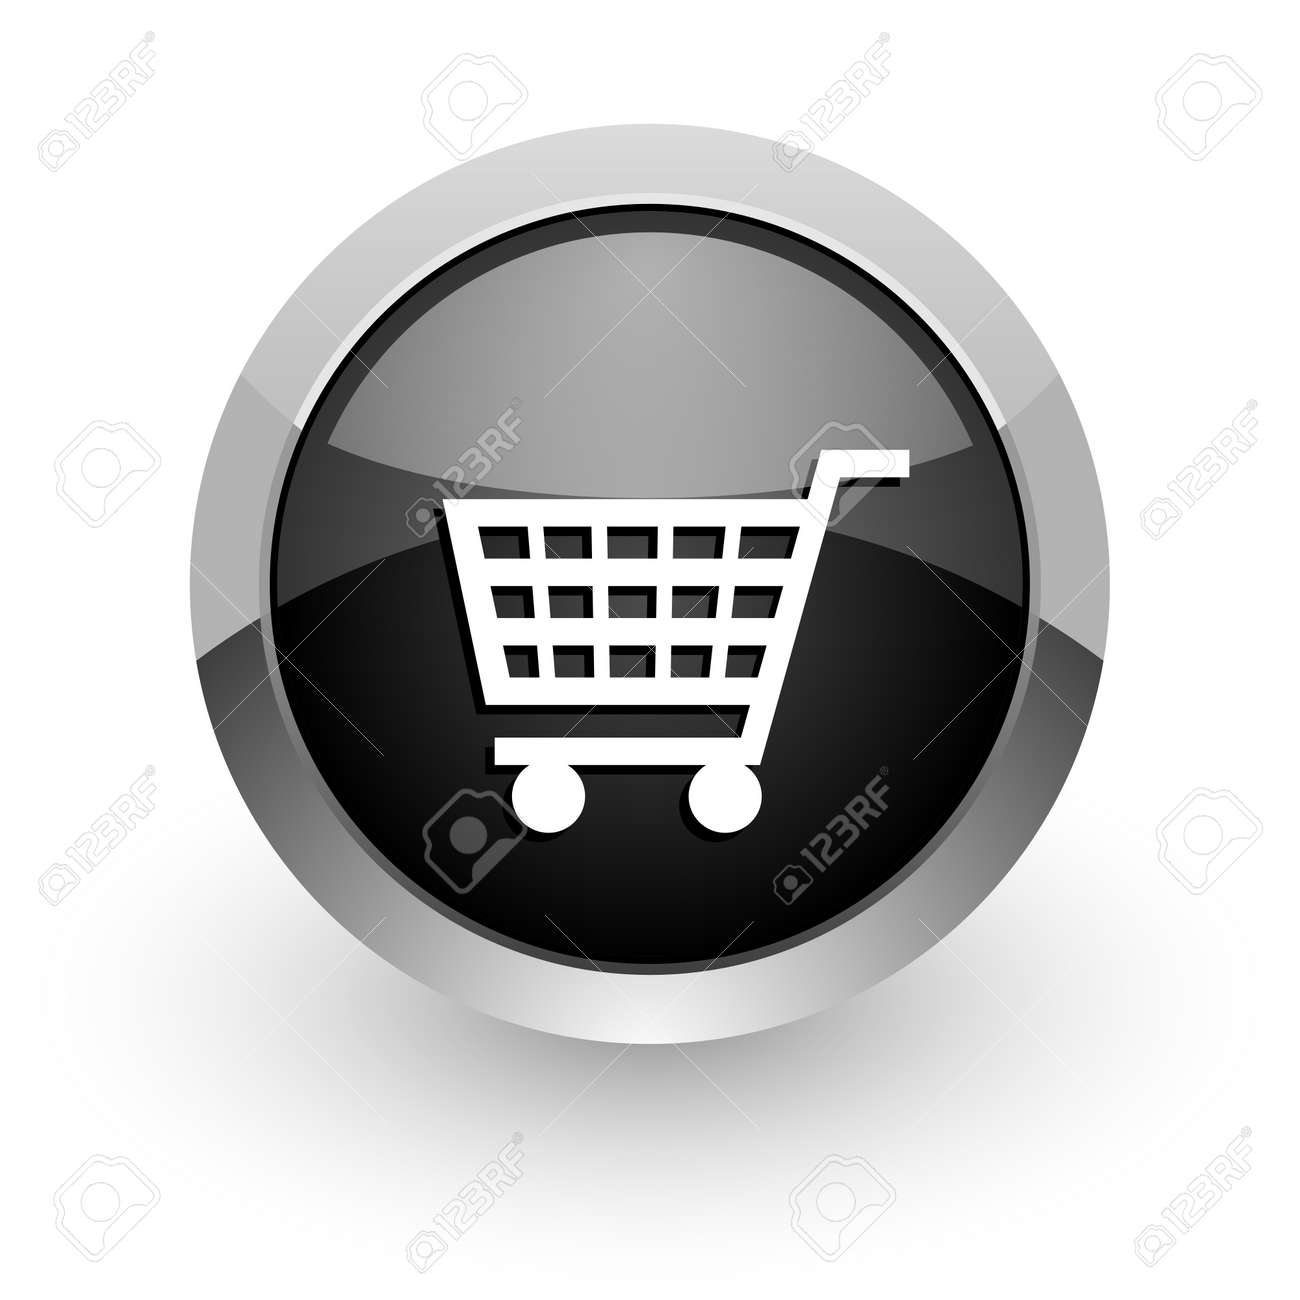 shopping cart icon Stock Photo - 14553490